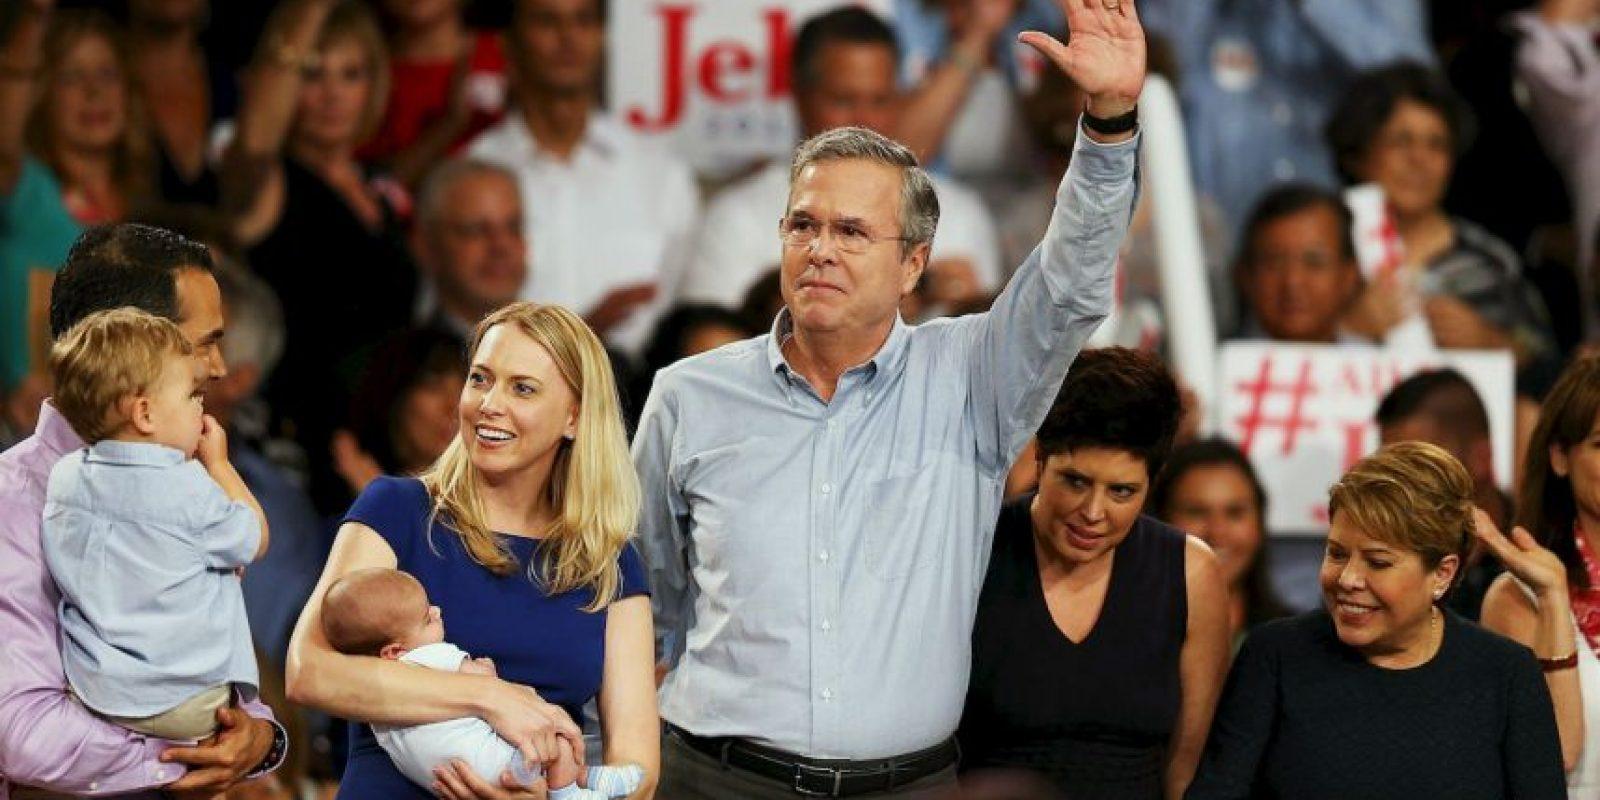 Miembros de su familia son de origen hispano. Foto:Getty Images